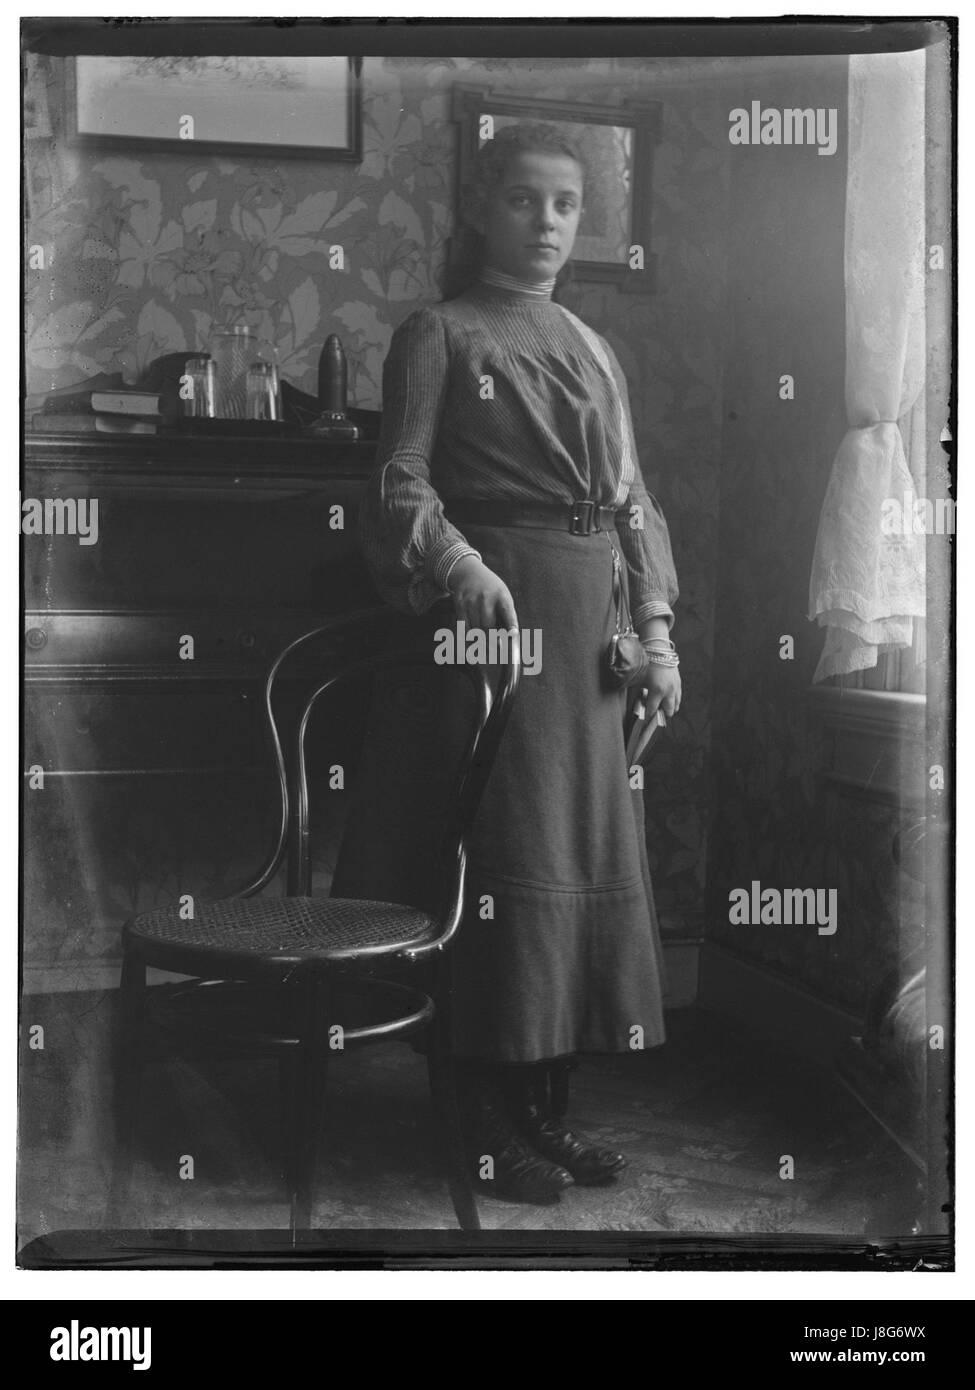 Mej Emmy Tiggelaar (max res) - Stock Image